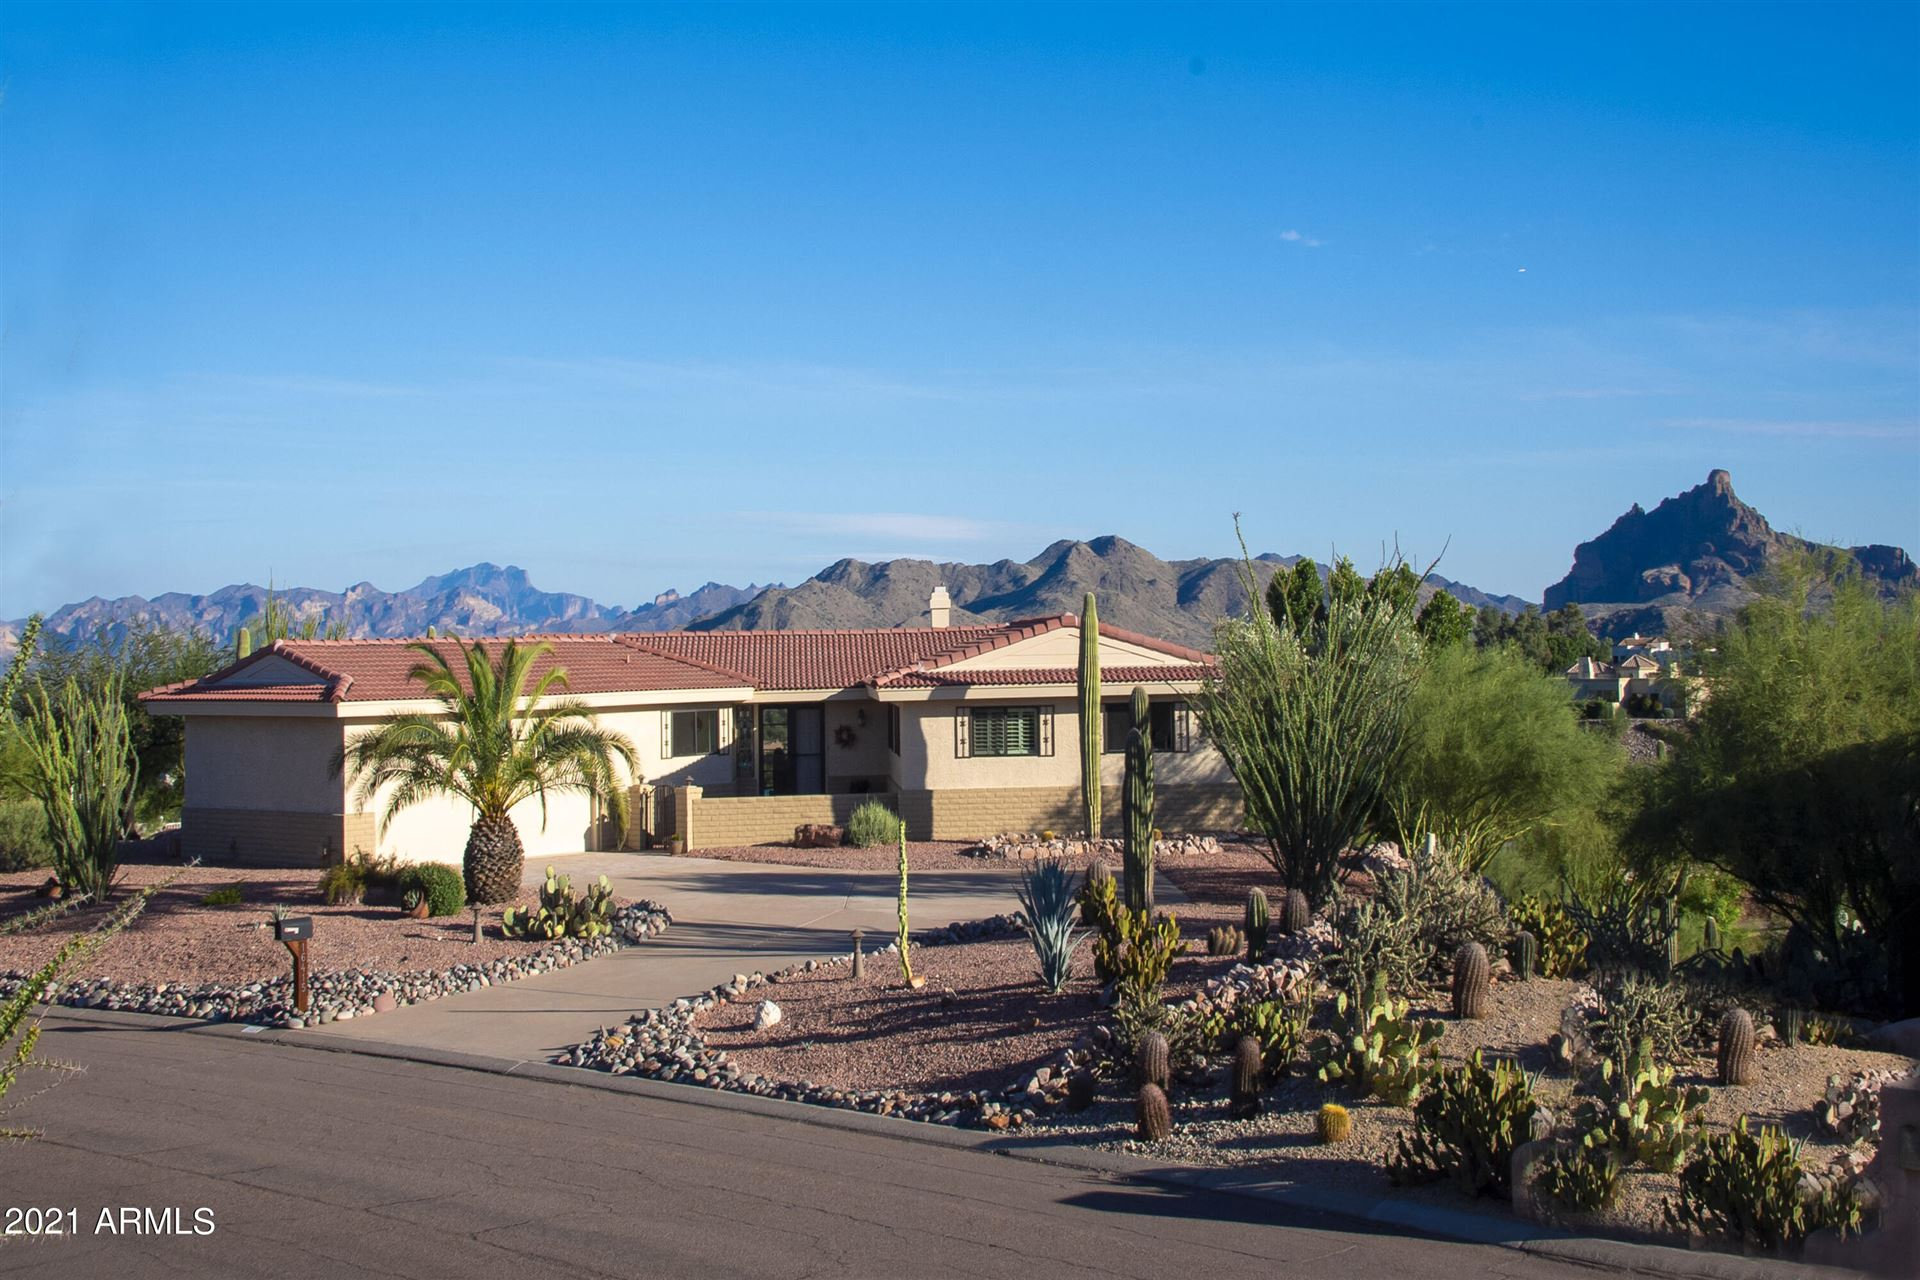 Photo of 16415 E INCA Avenue, Fountain Hills, AZ 85268 (MLS # 6306216)